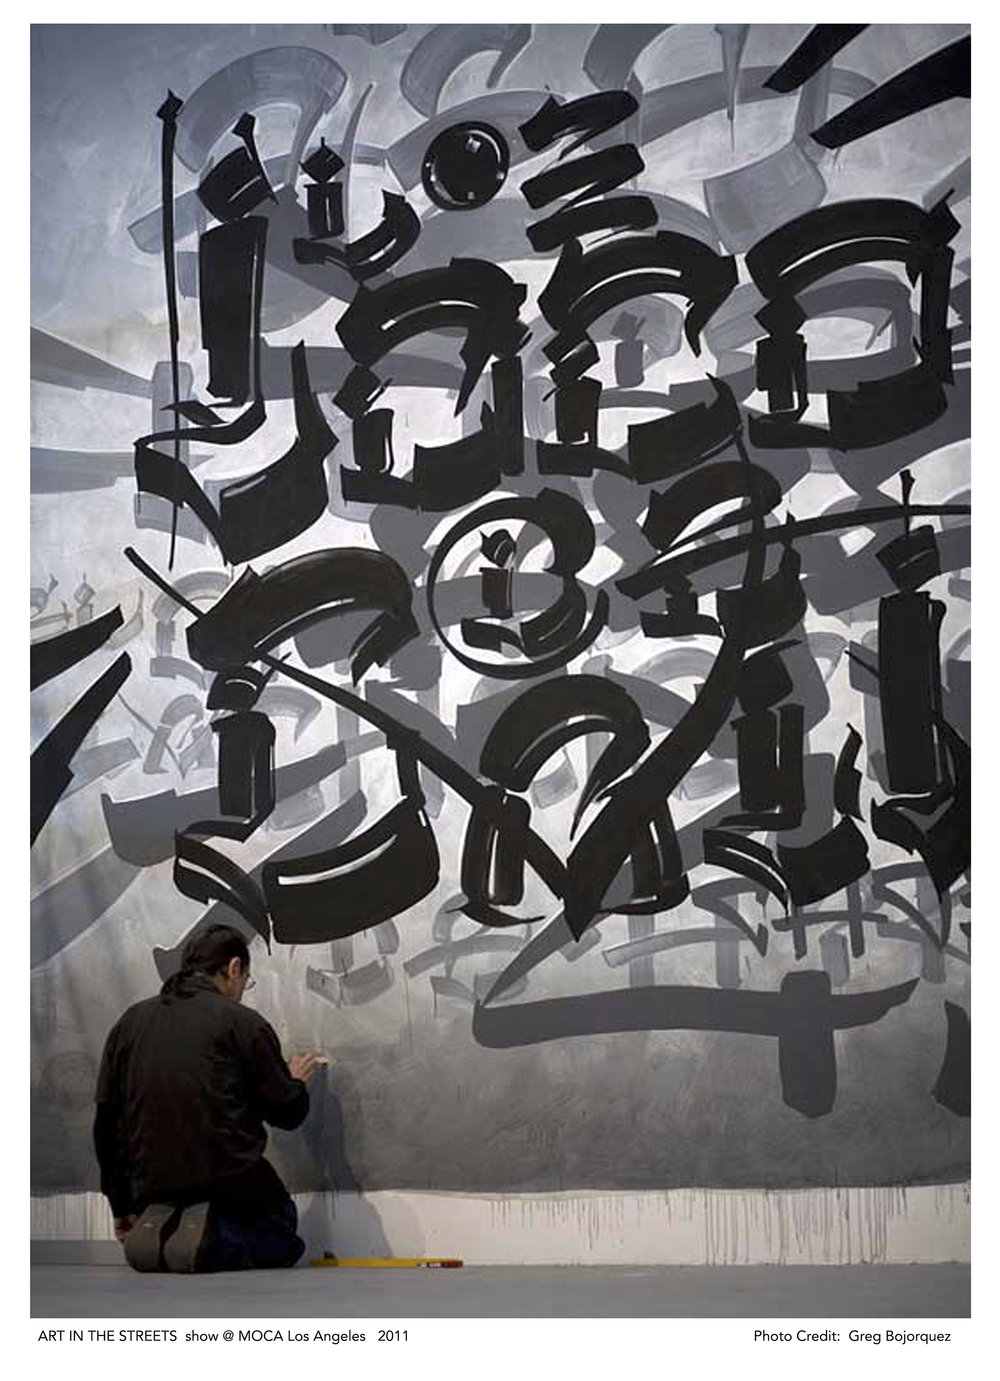 Chaz@MOCA by G.Bojorquez'5-11.jpg